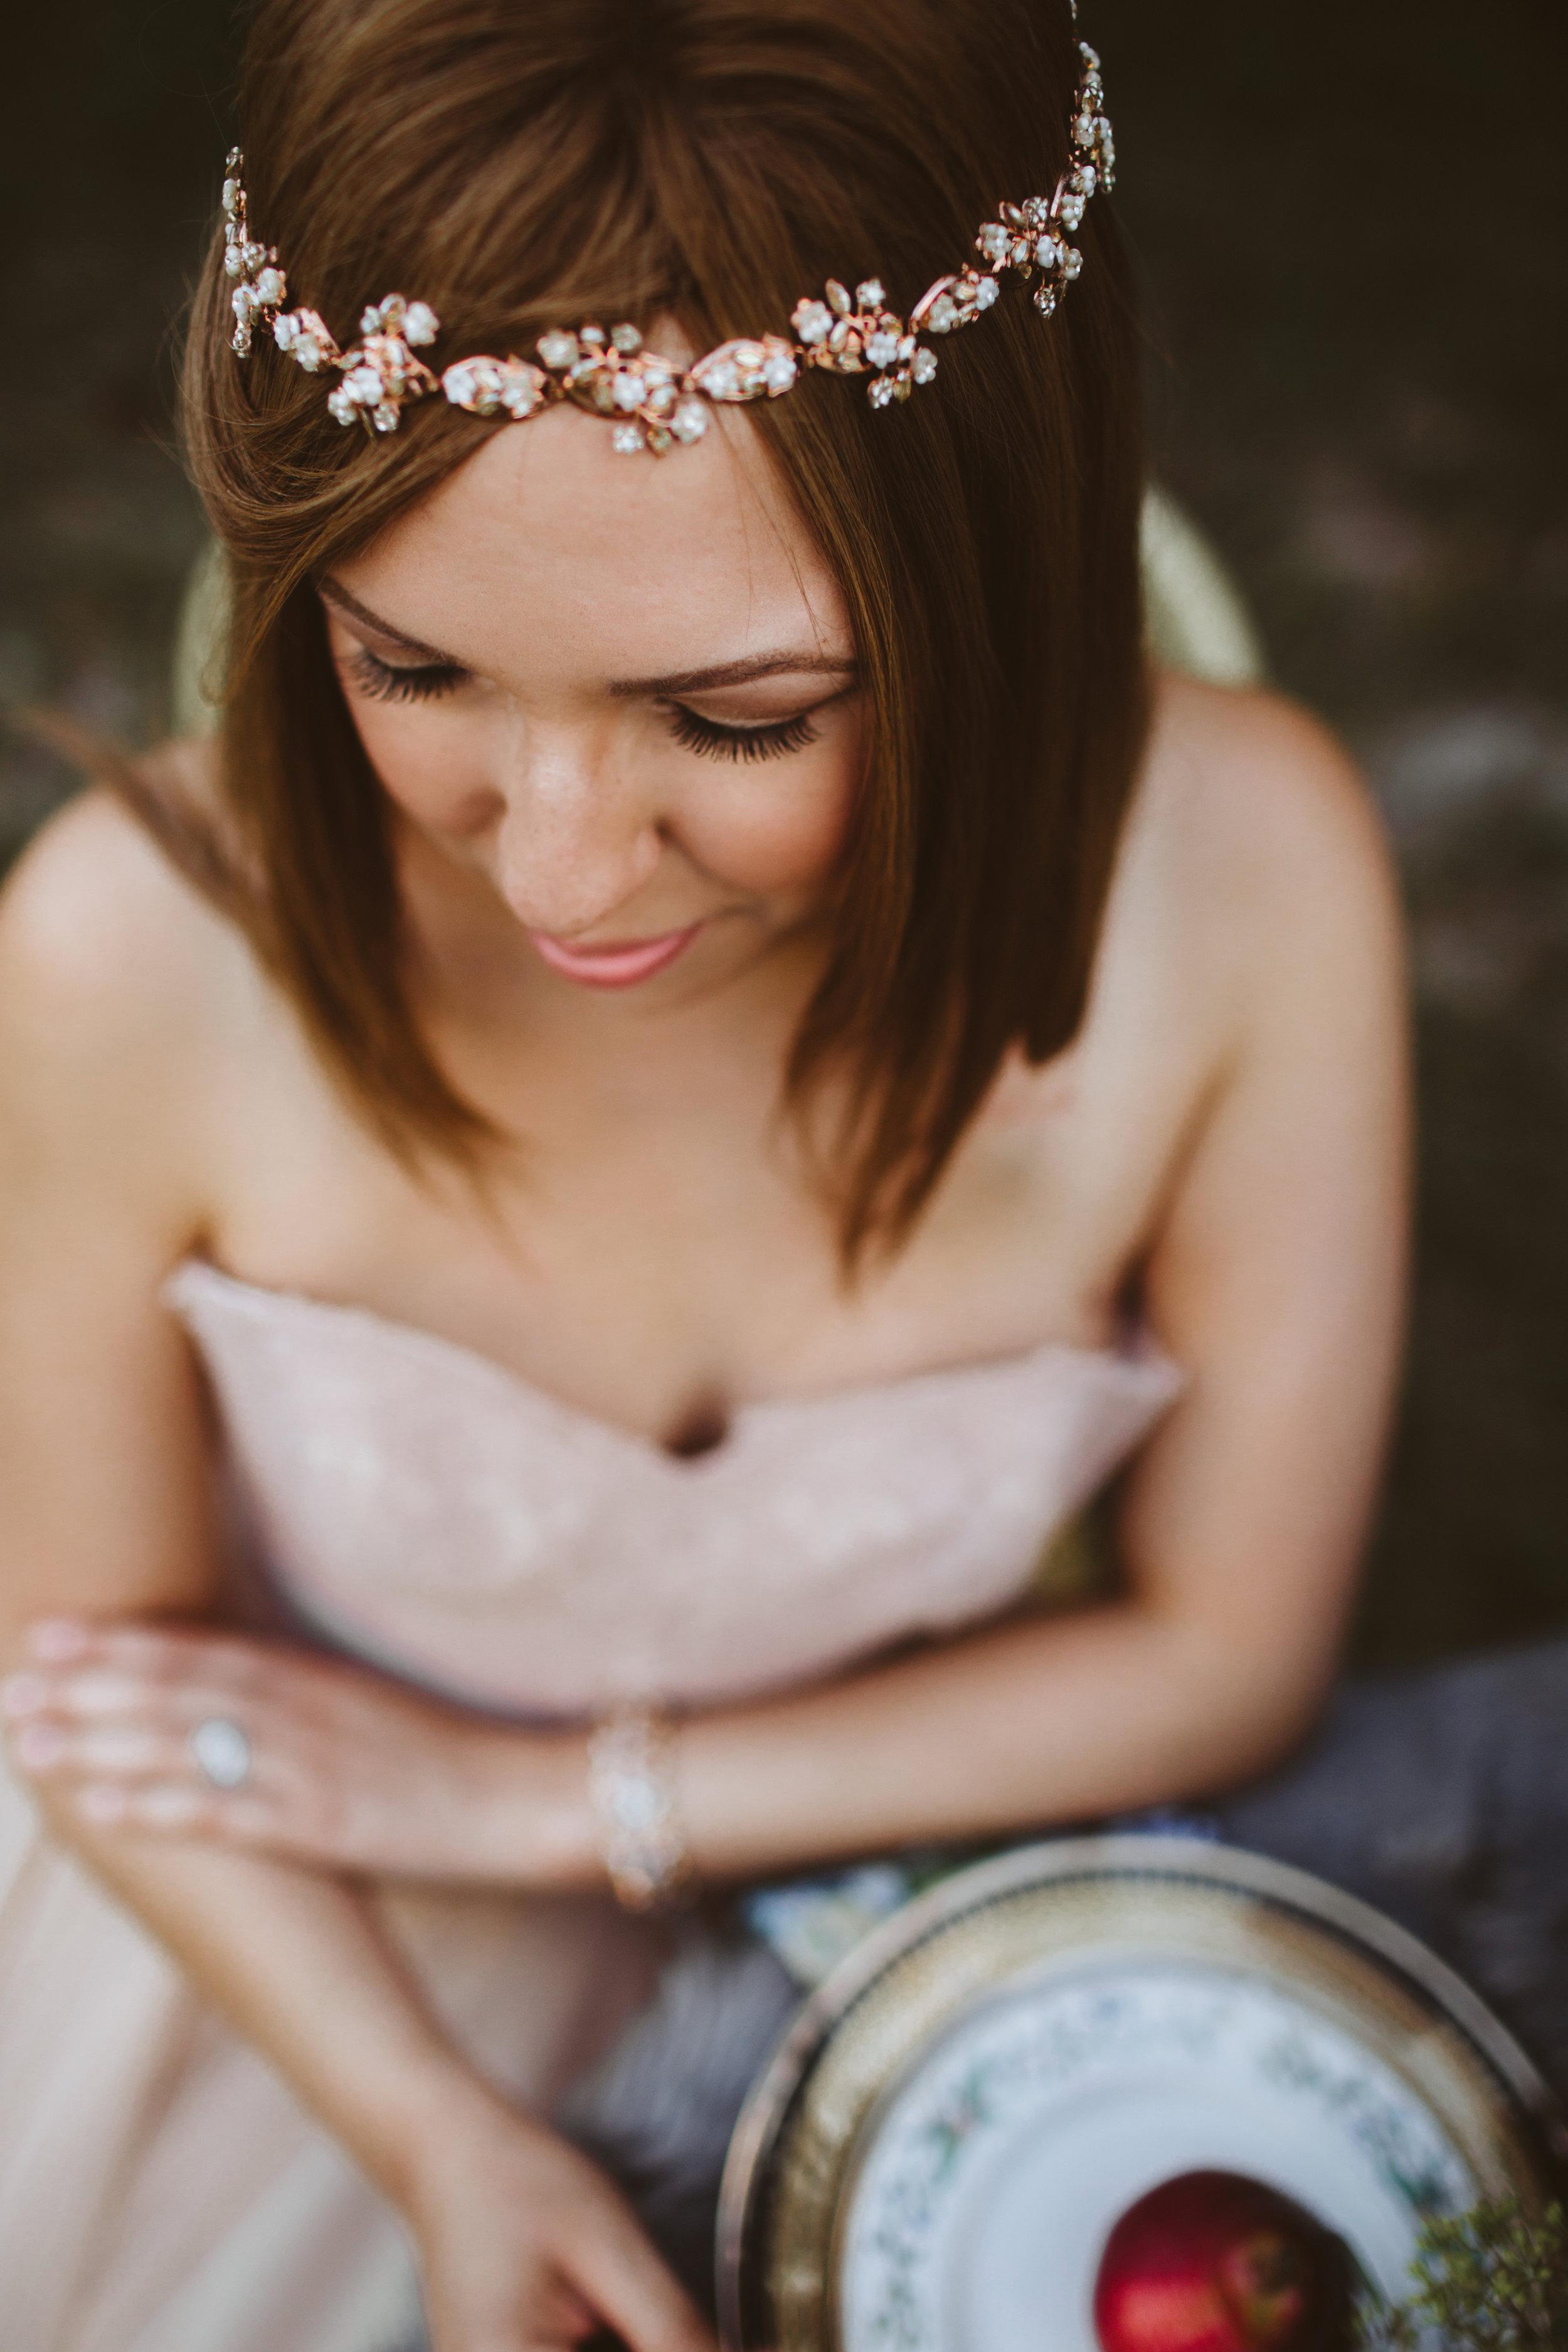 Breast Cancer awareness | Solutions bridal | Waterswoo | Vanessa Boy | vanessaboy.com |-450.com |final.jpg